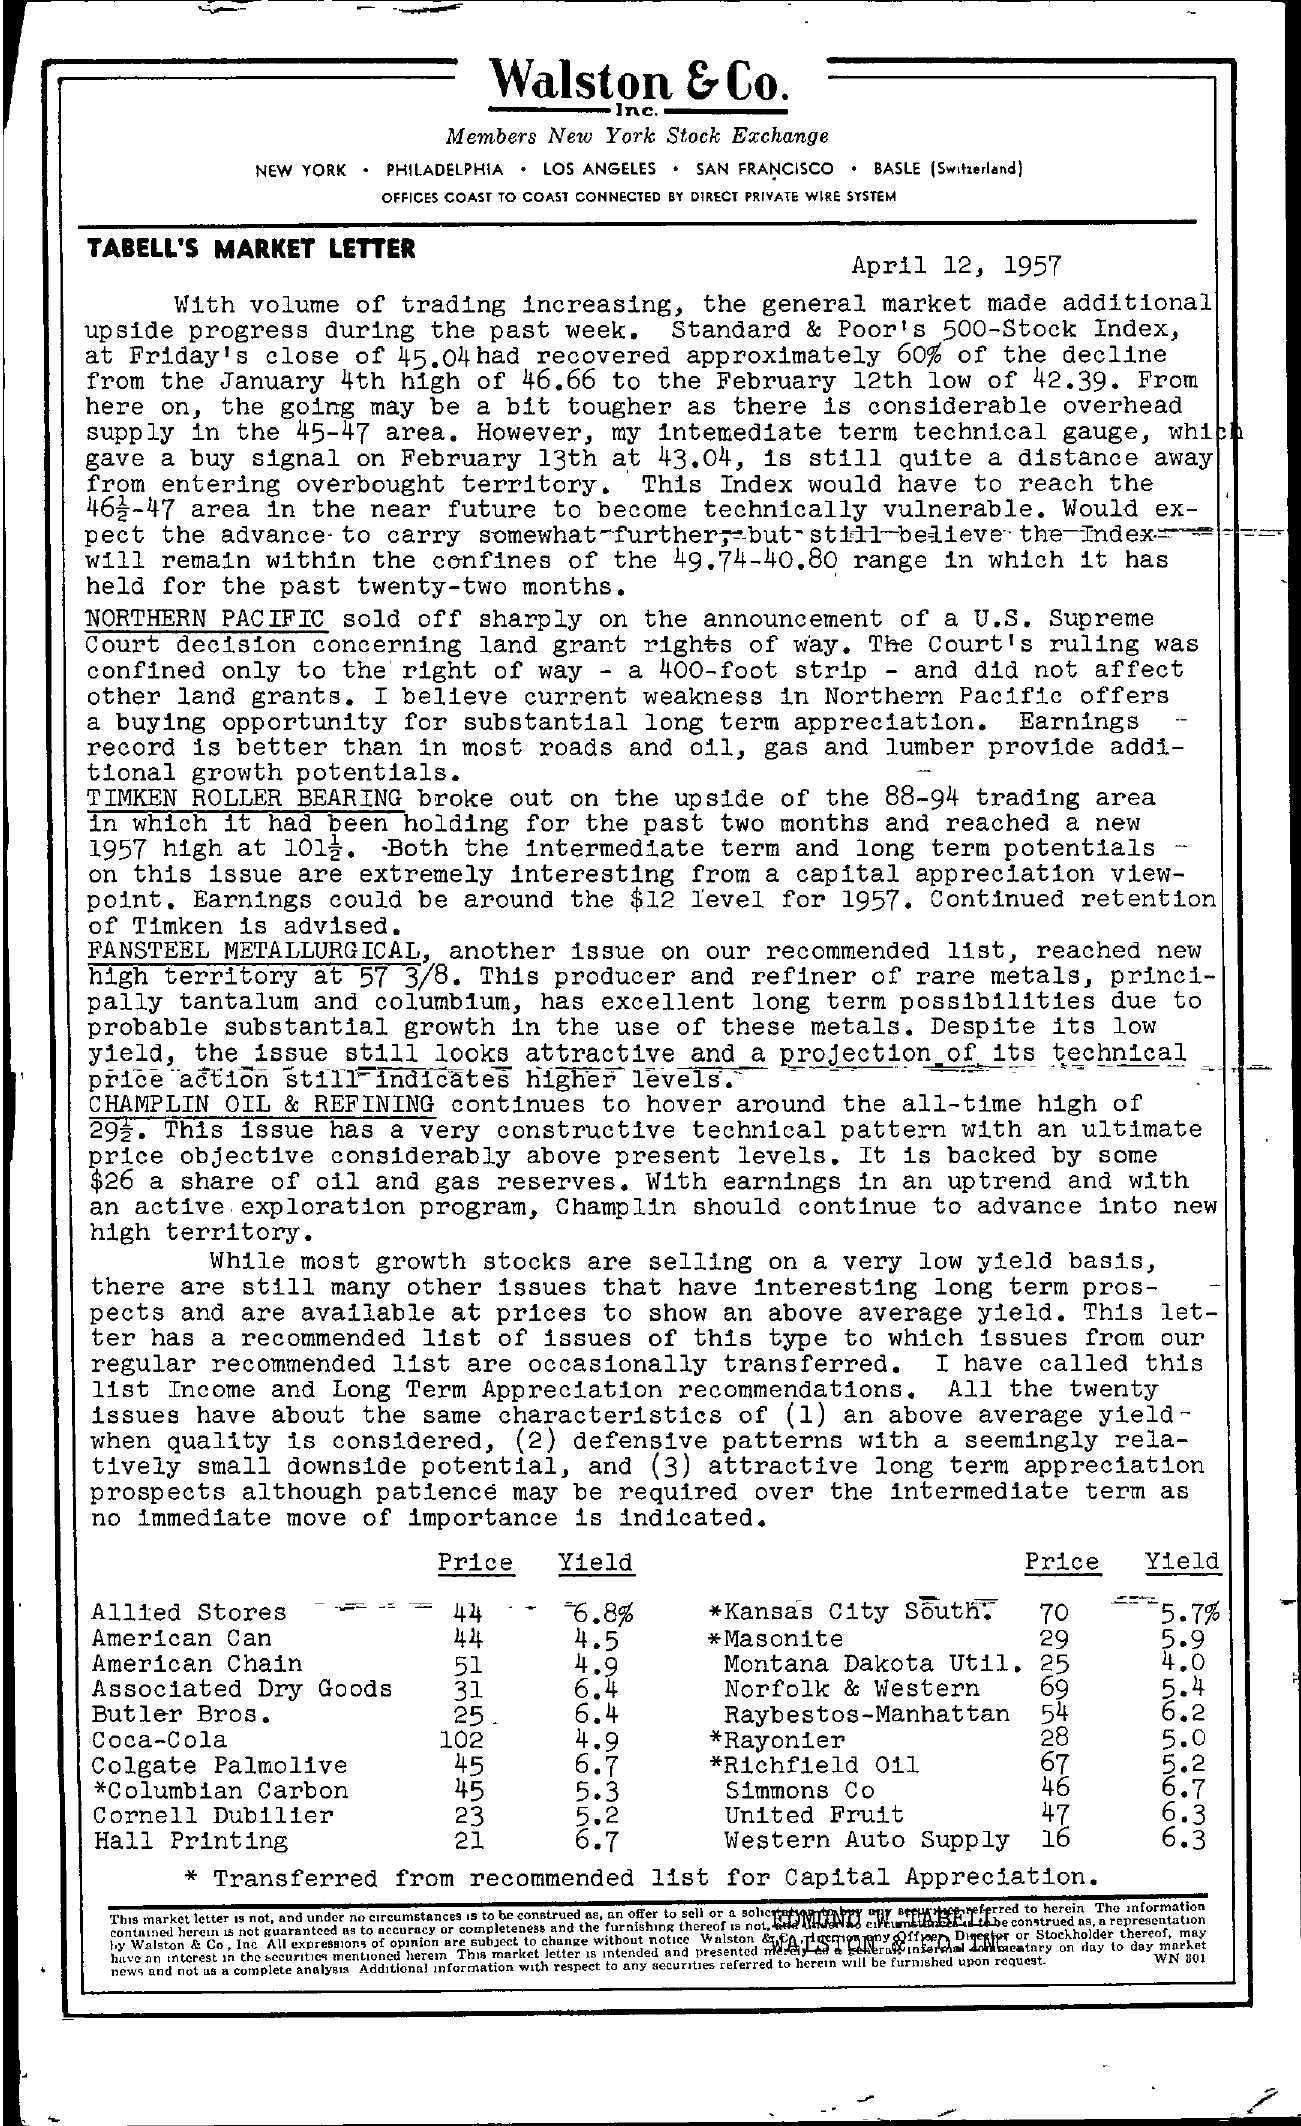 Tabell's Market Letter - April 12, 1957